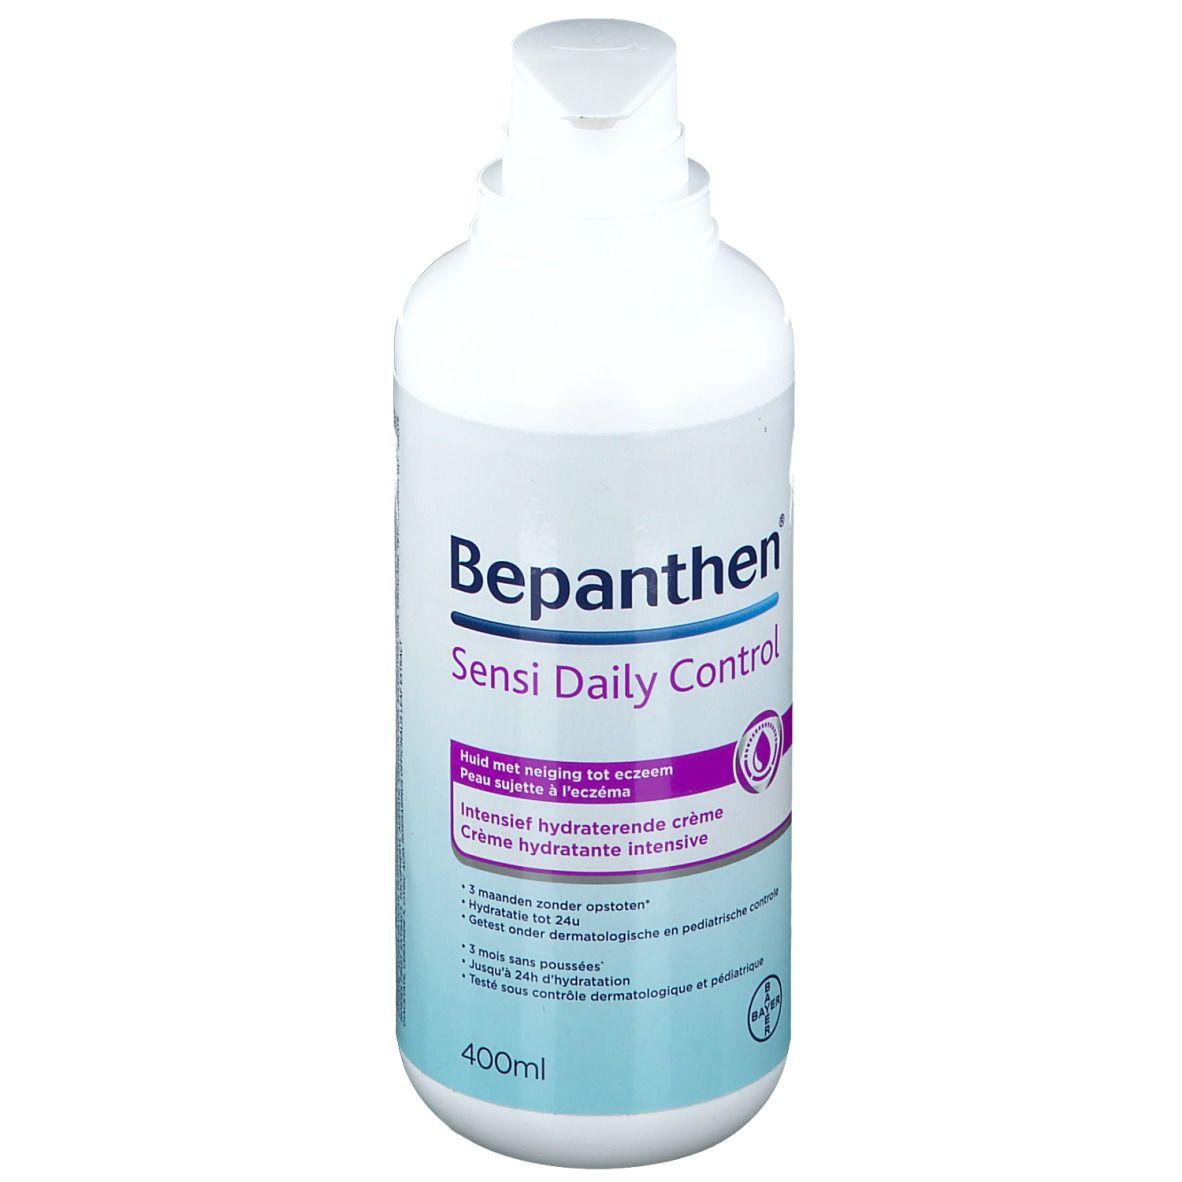 Bepanthen® Sensi Daily Control Crème hydratante intensive